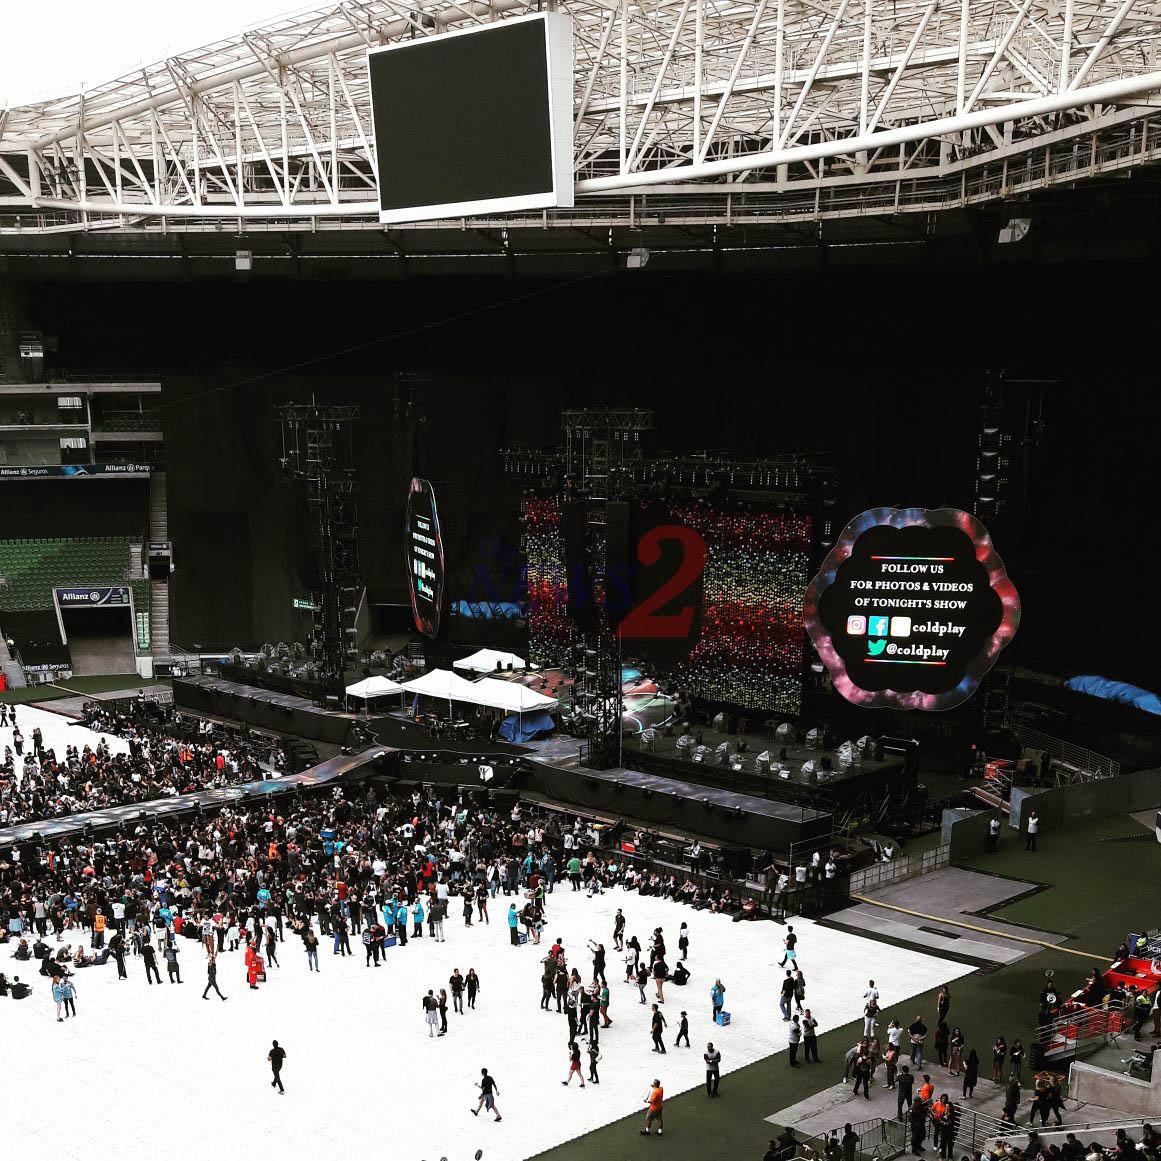 Coldplay Megashow -Brazil 2017